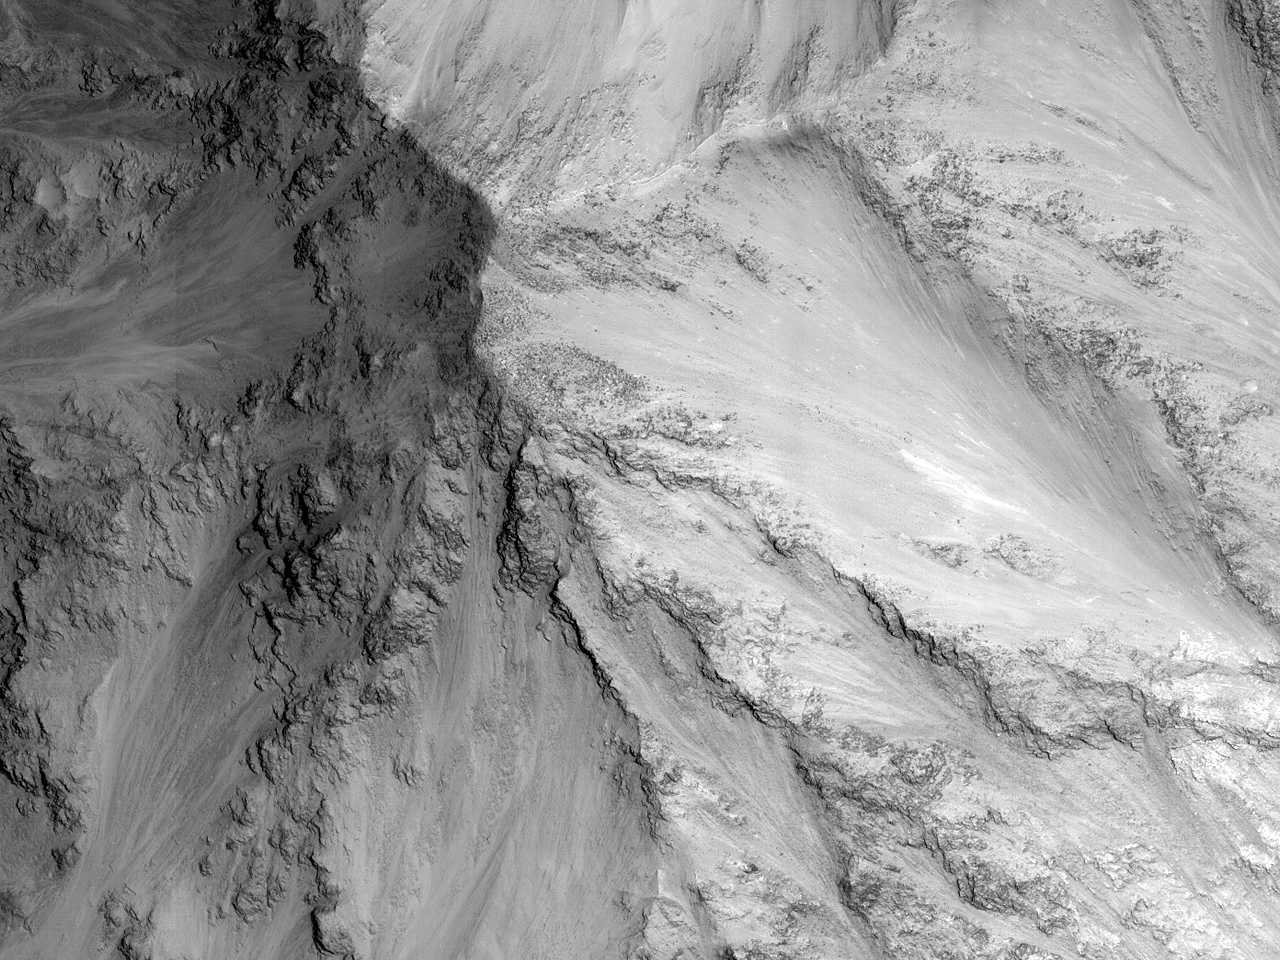 Monitorizarea pantelor dincanionul Capri (Capri Chasma)